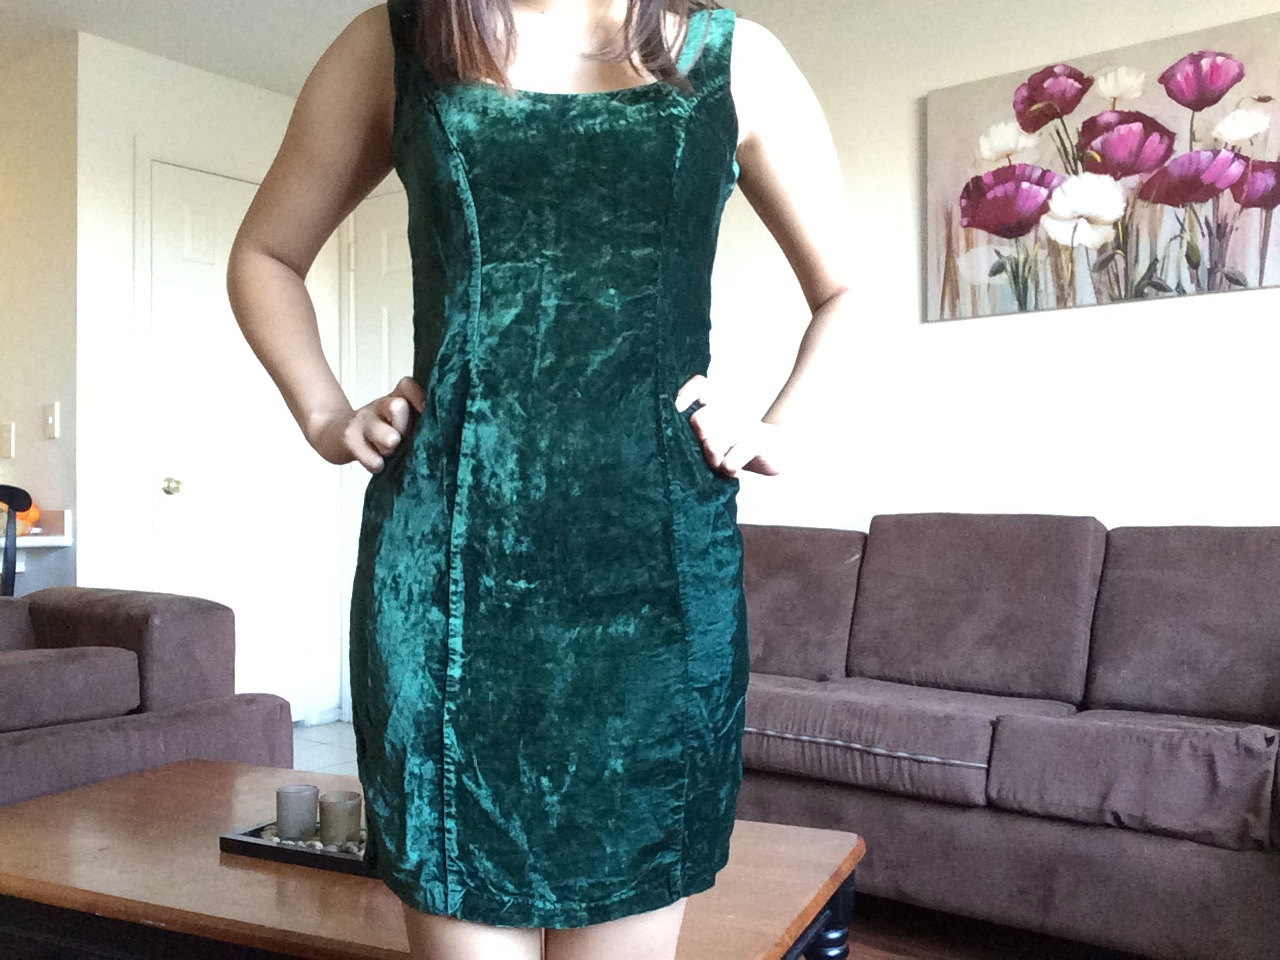 Rare vintage 80's dark green crushed velvet betsy johnson body con dress: punk label